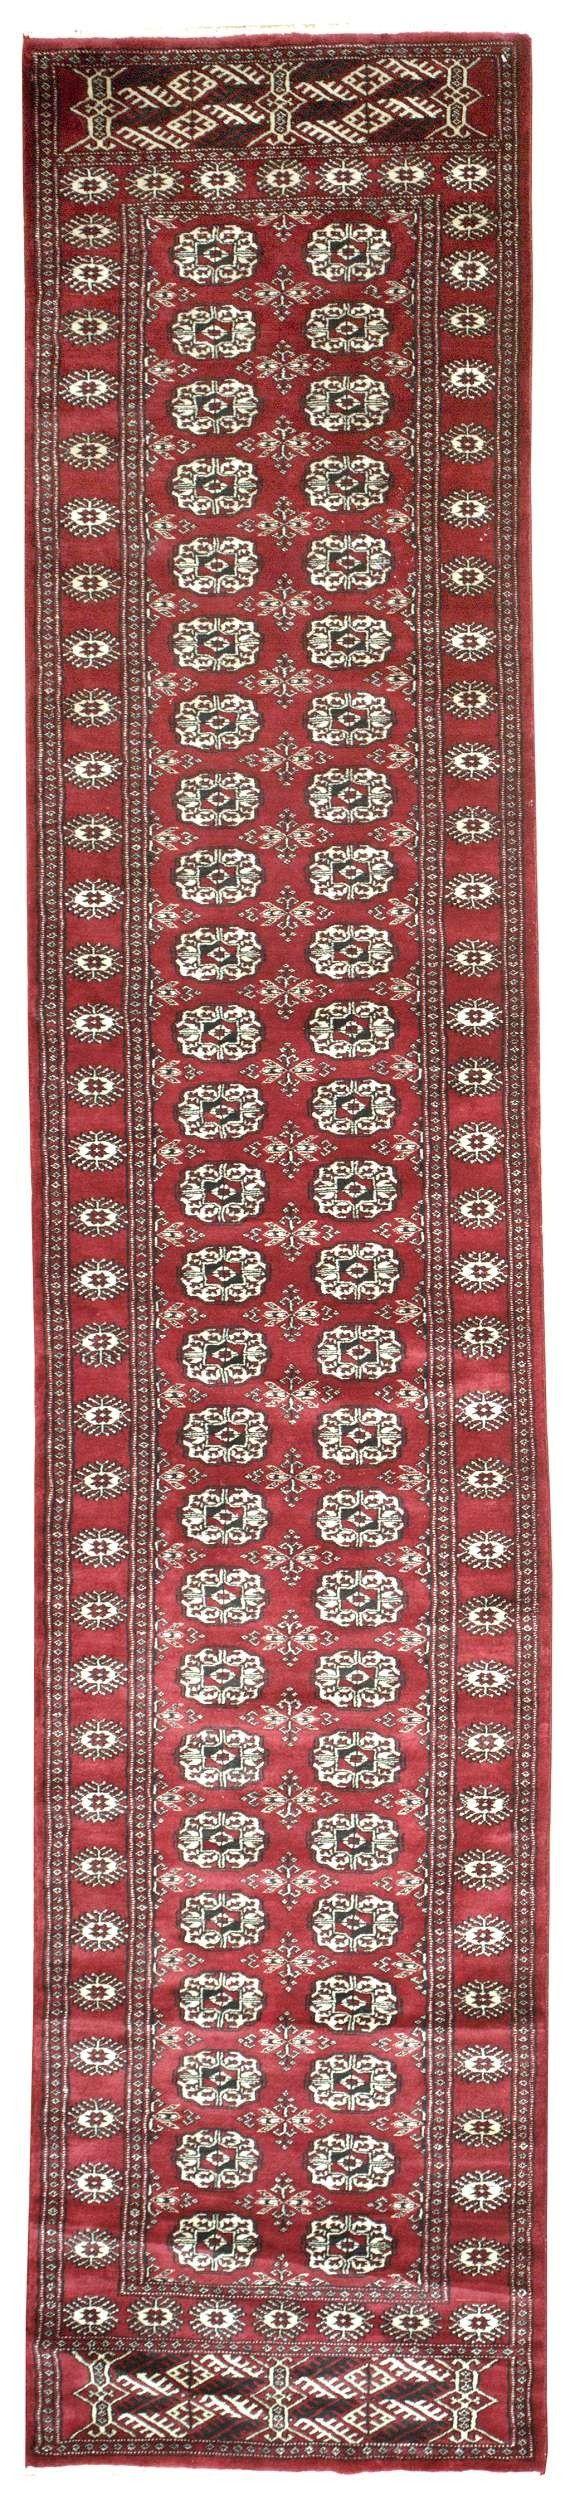 best area rug houston images on pinterest  houston area rugs  - new contemporary turkoman bokhara area rug   area rug area rugshoustonarea rugs